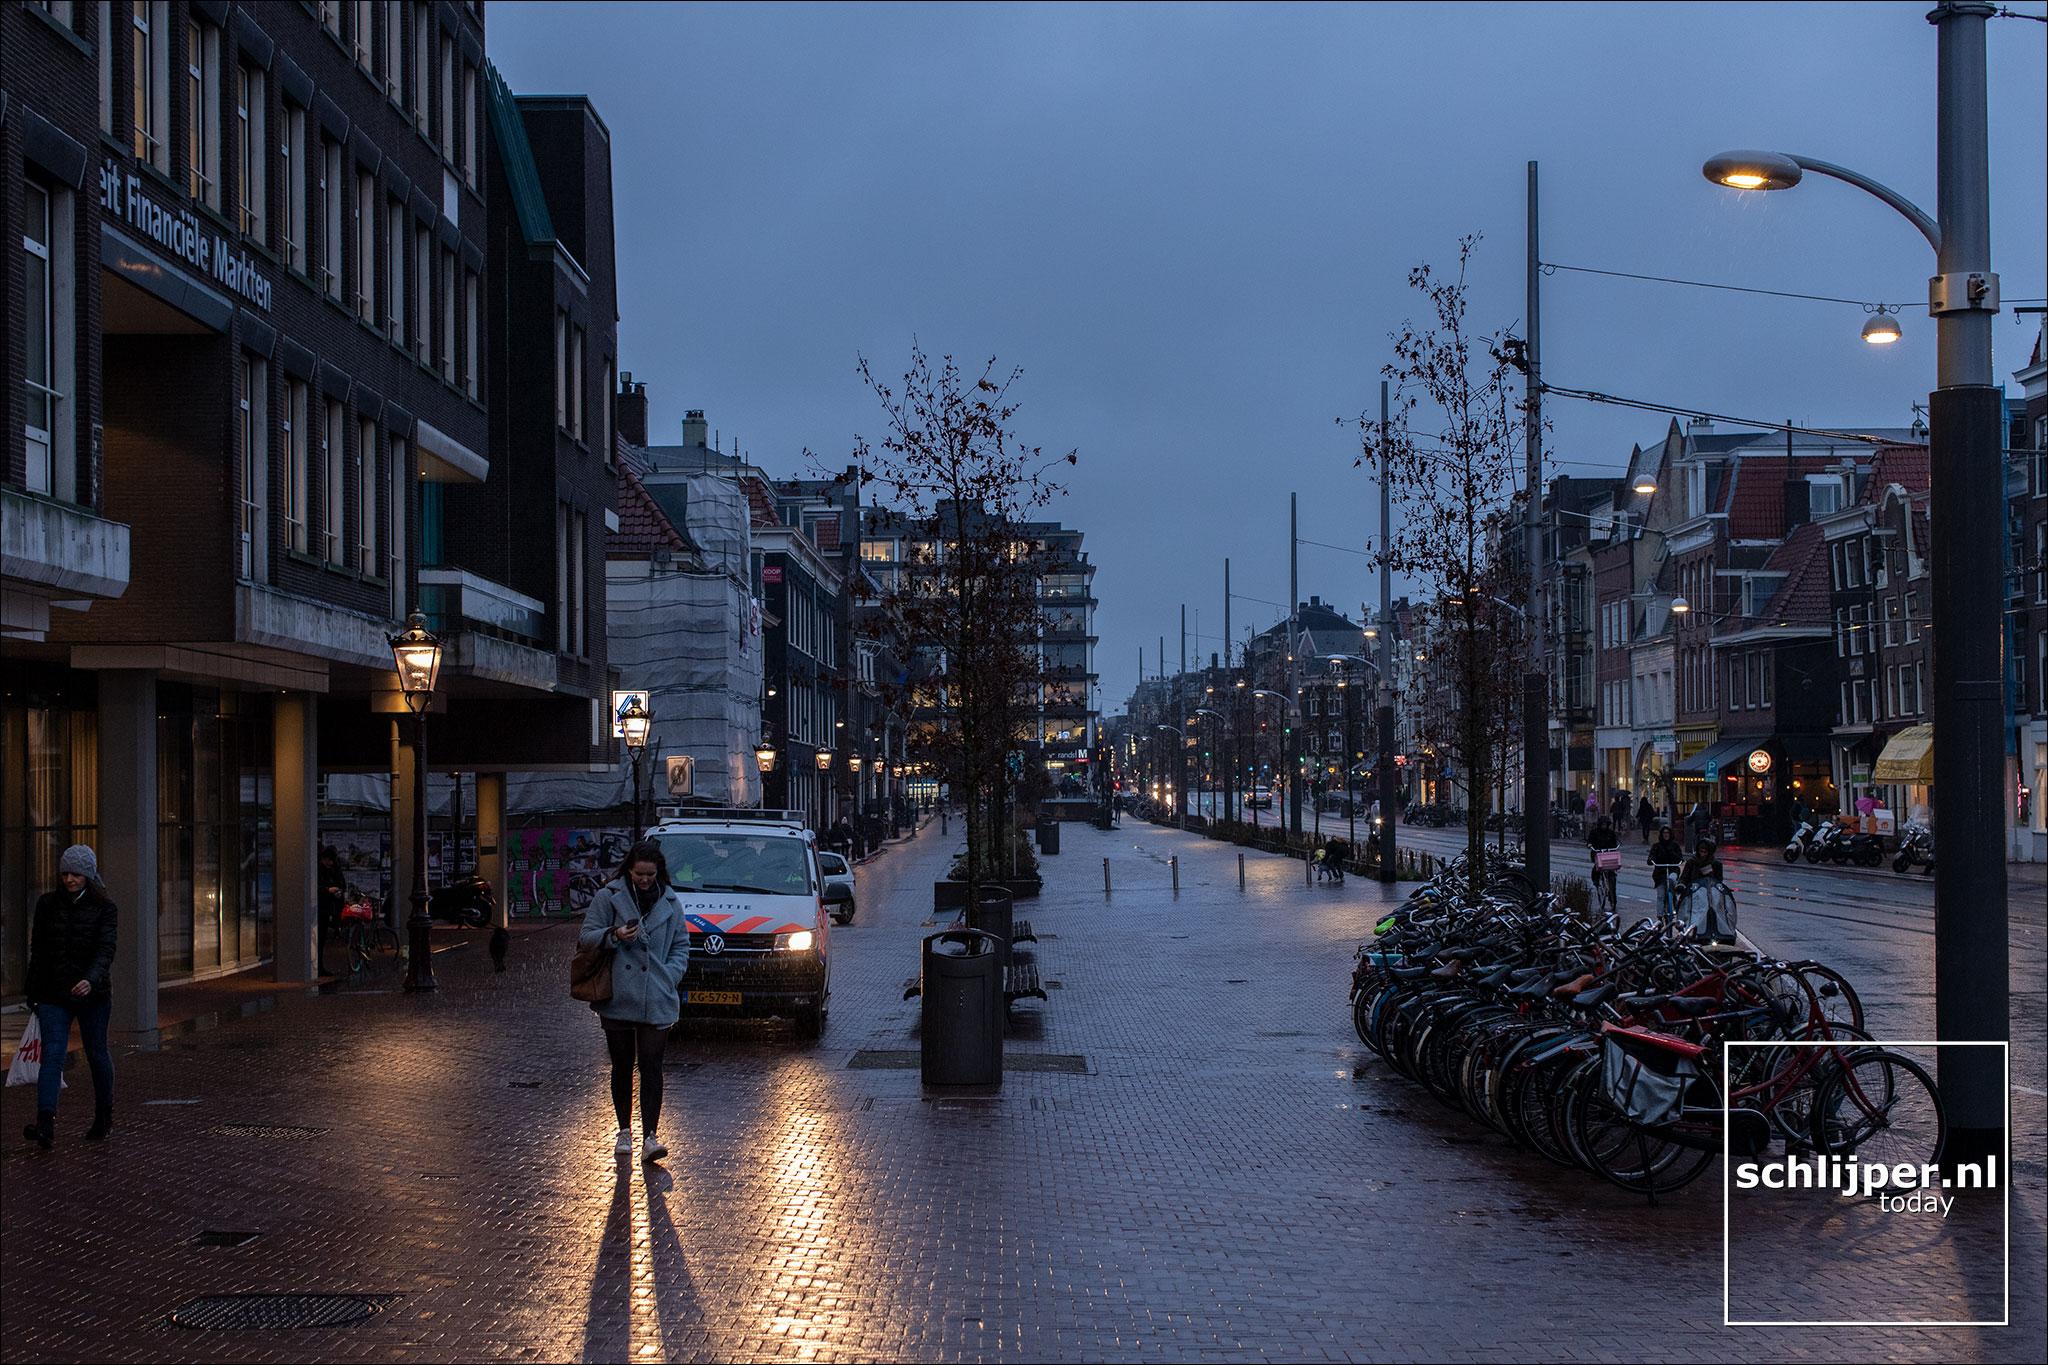 Nederland, Amsterdam, 6 februari 2019